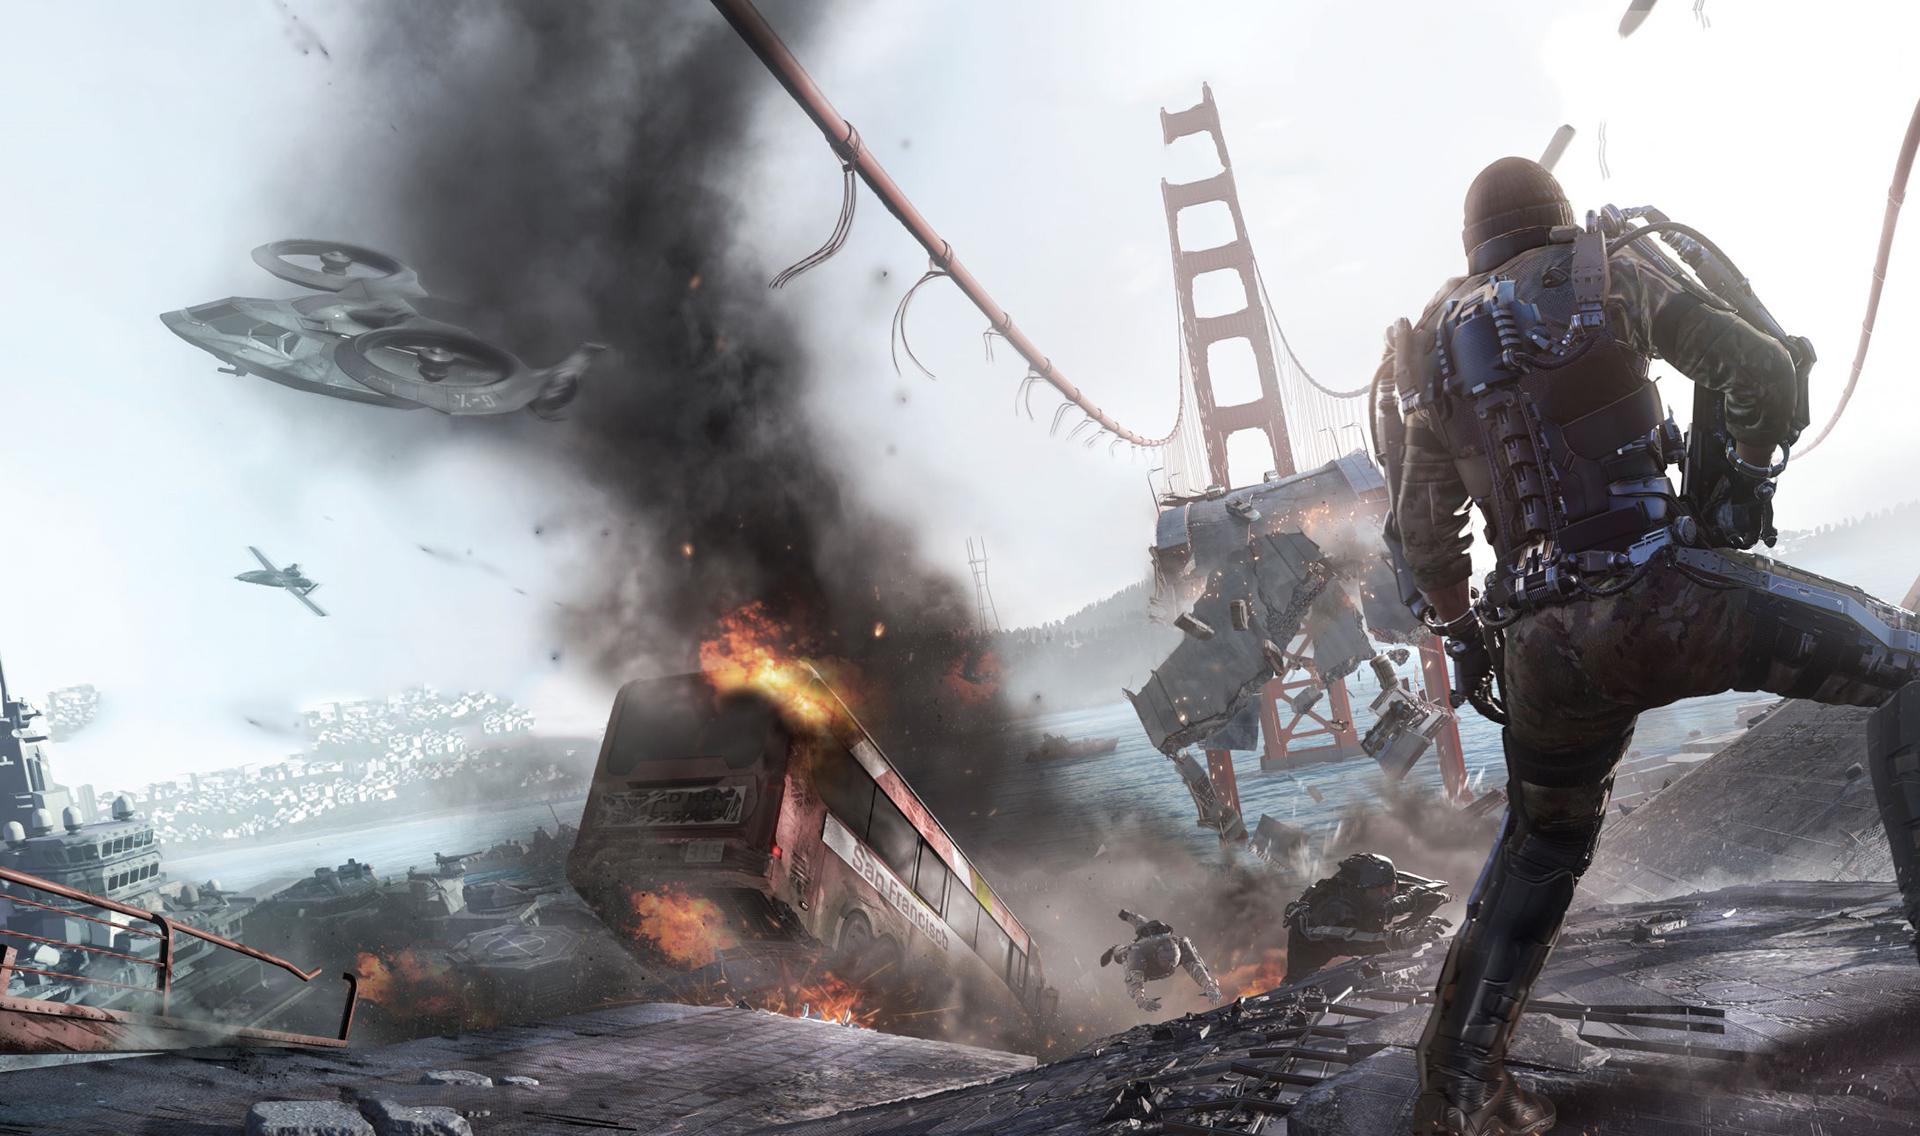 Call Of Duty Advanced Warfare Hd Wallpaper Background Image 1920x1136 Id 670433 Wallpaper Abyss